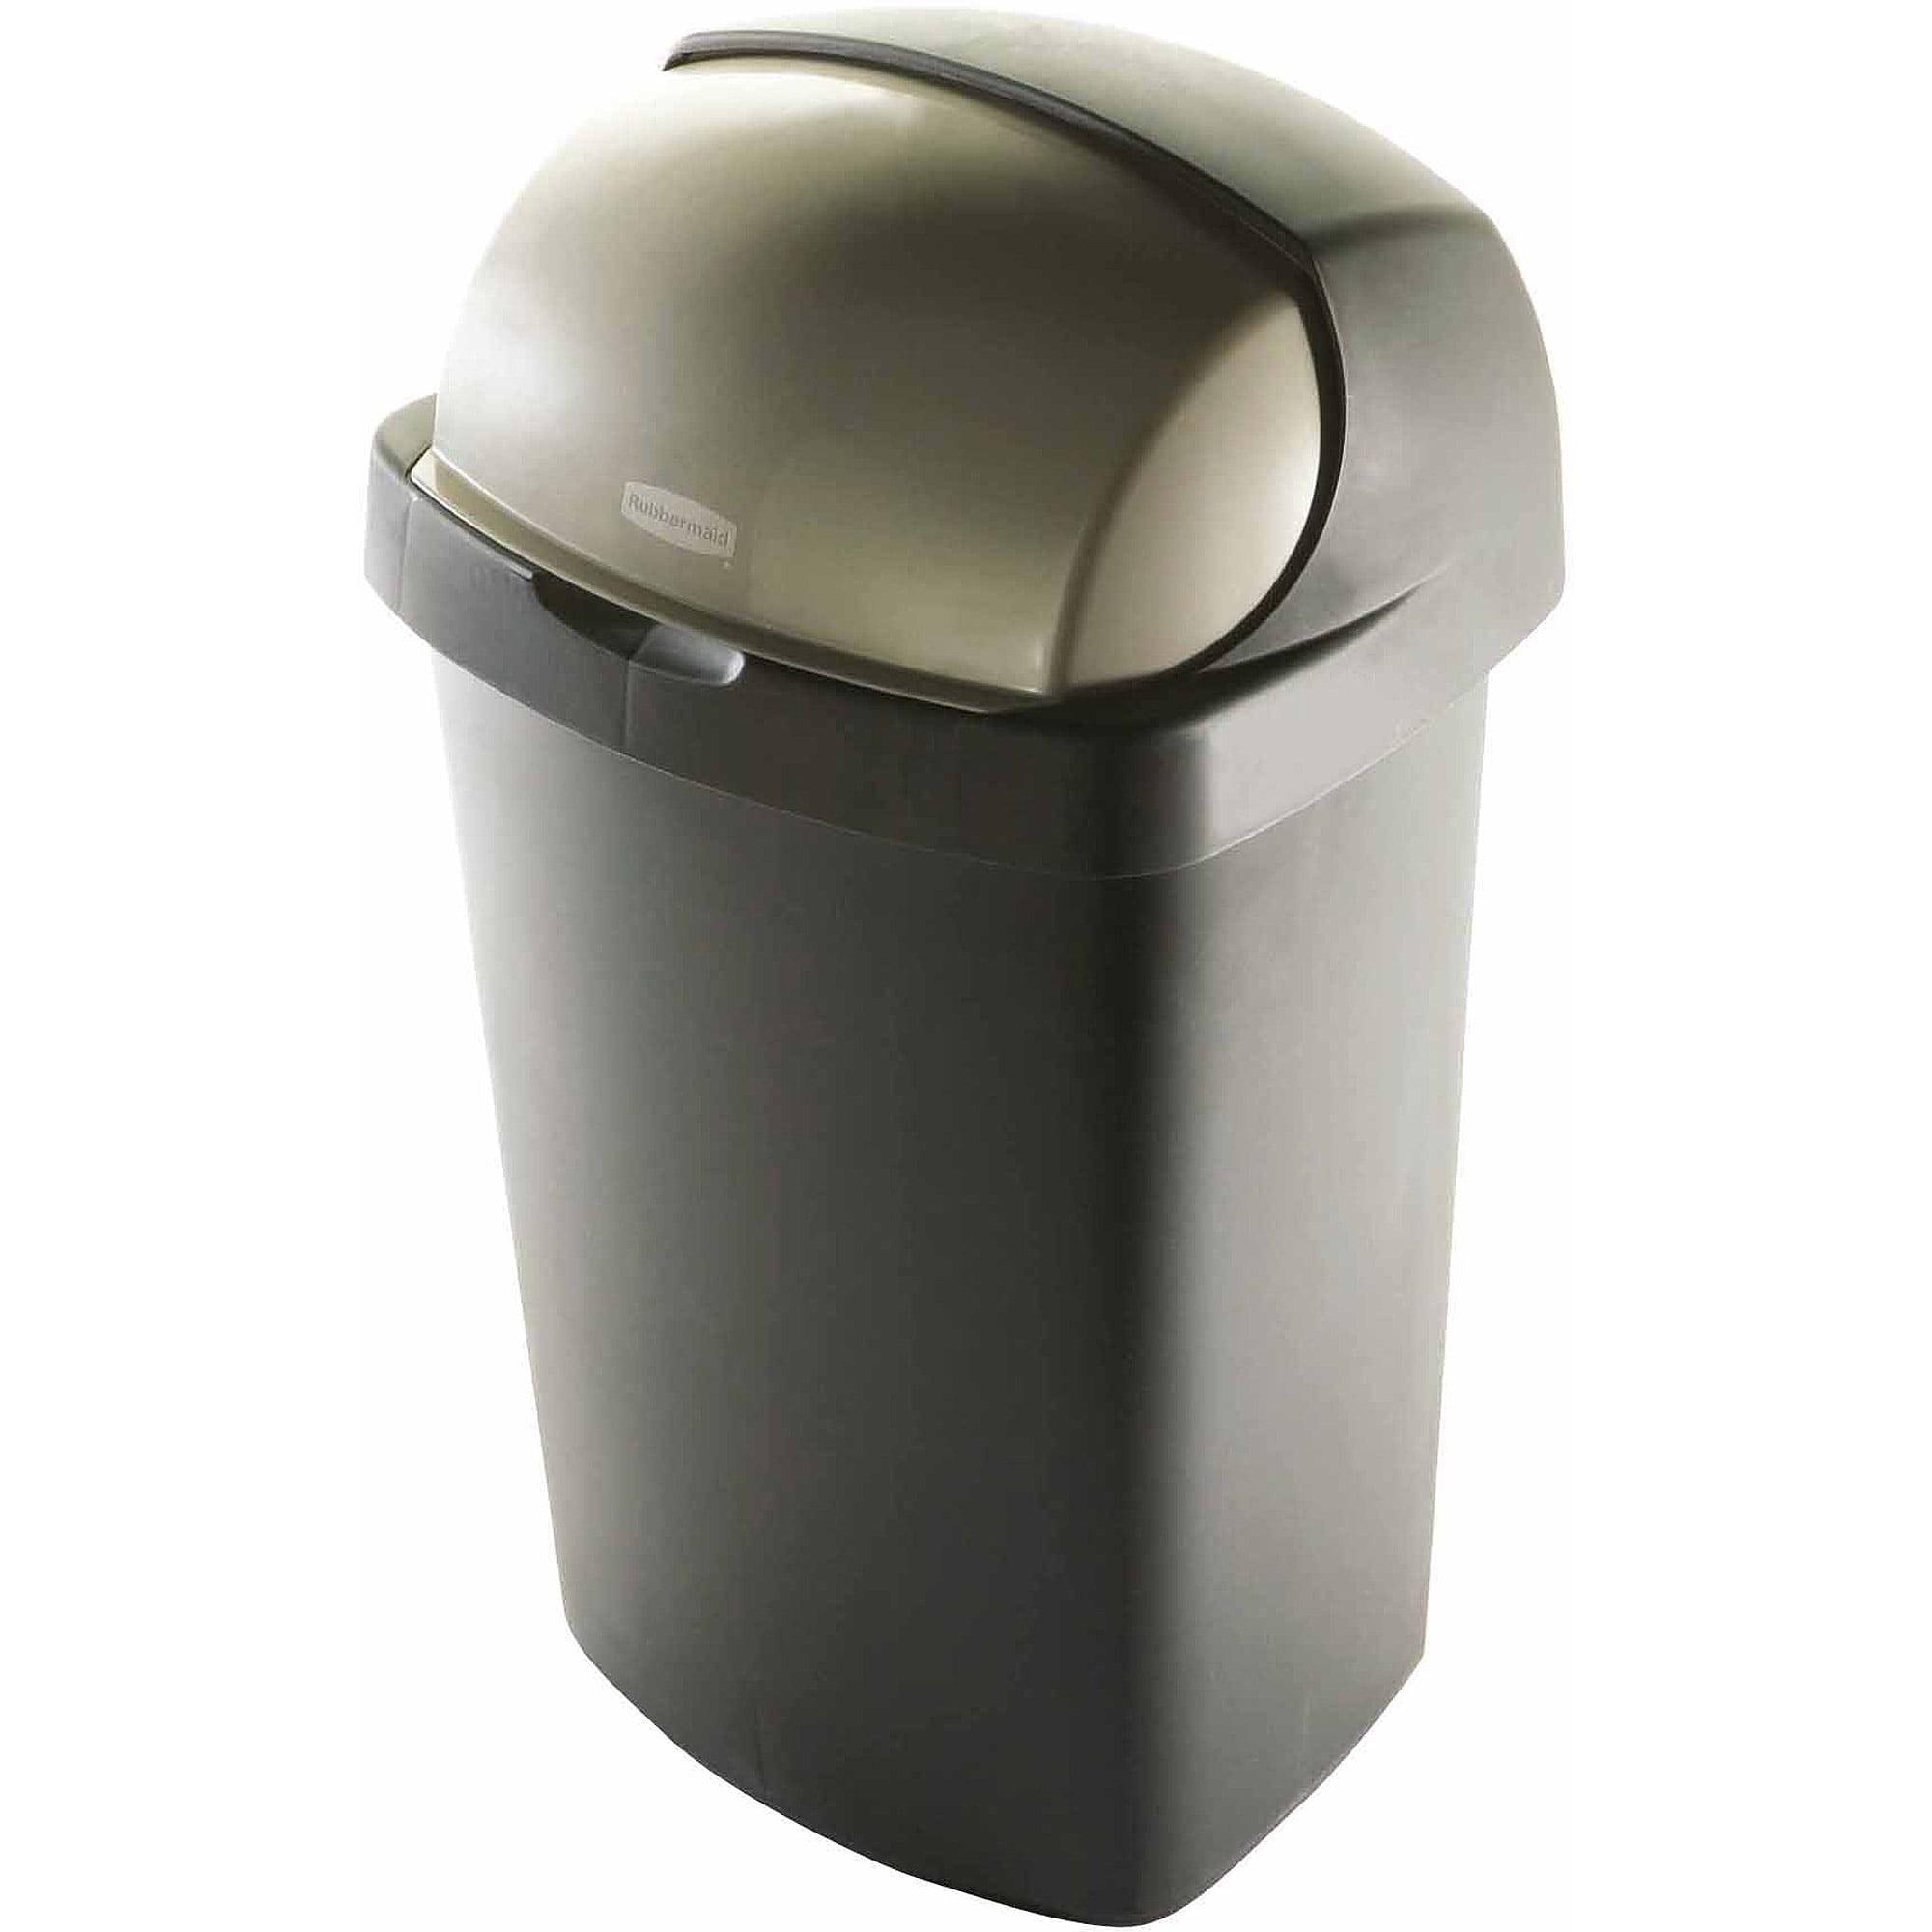 Rubbermaid 13 Gallon Roll Top Wastebasket Bronze